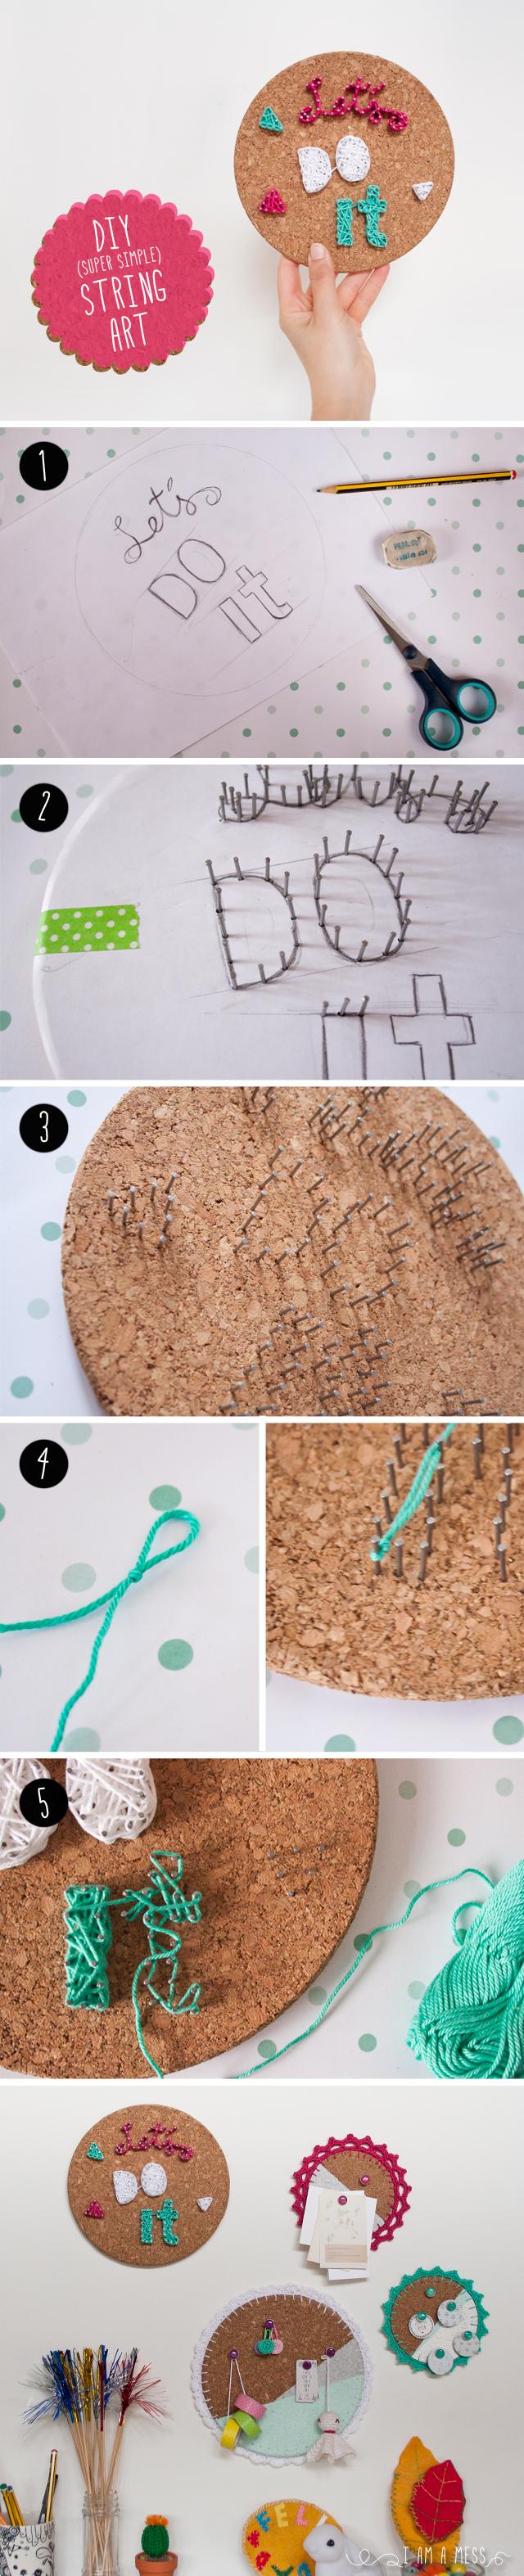 String Art con corcho, visto en IamaMess blog